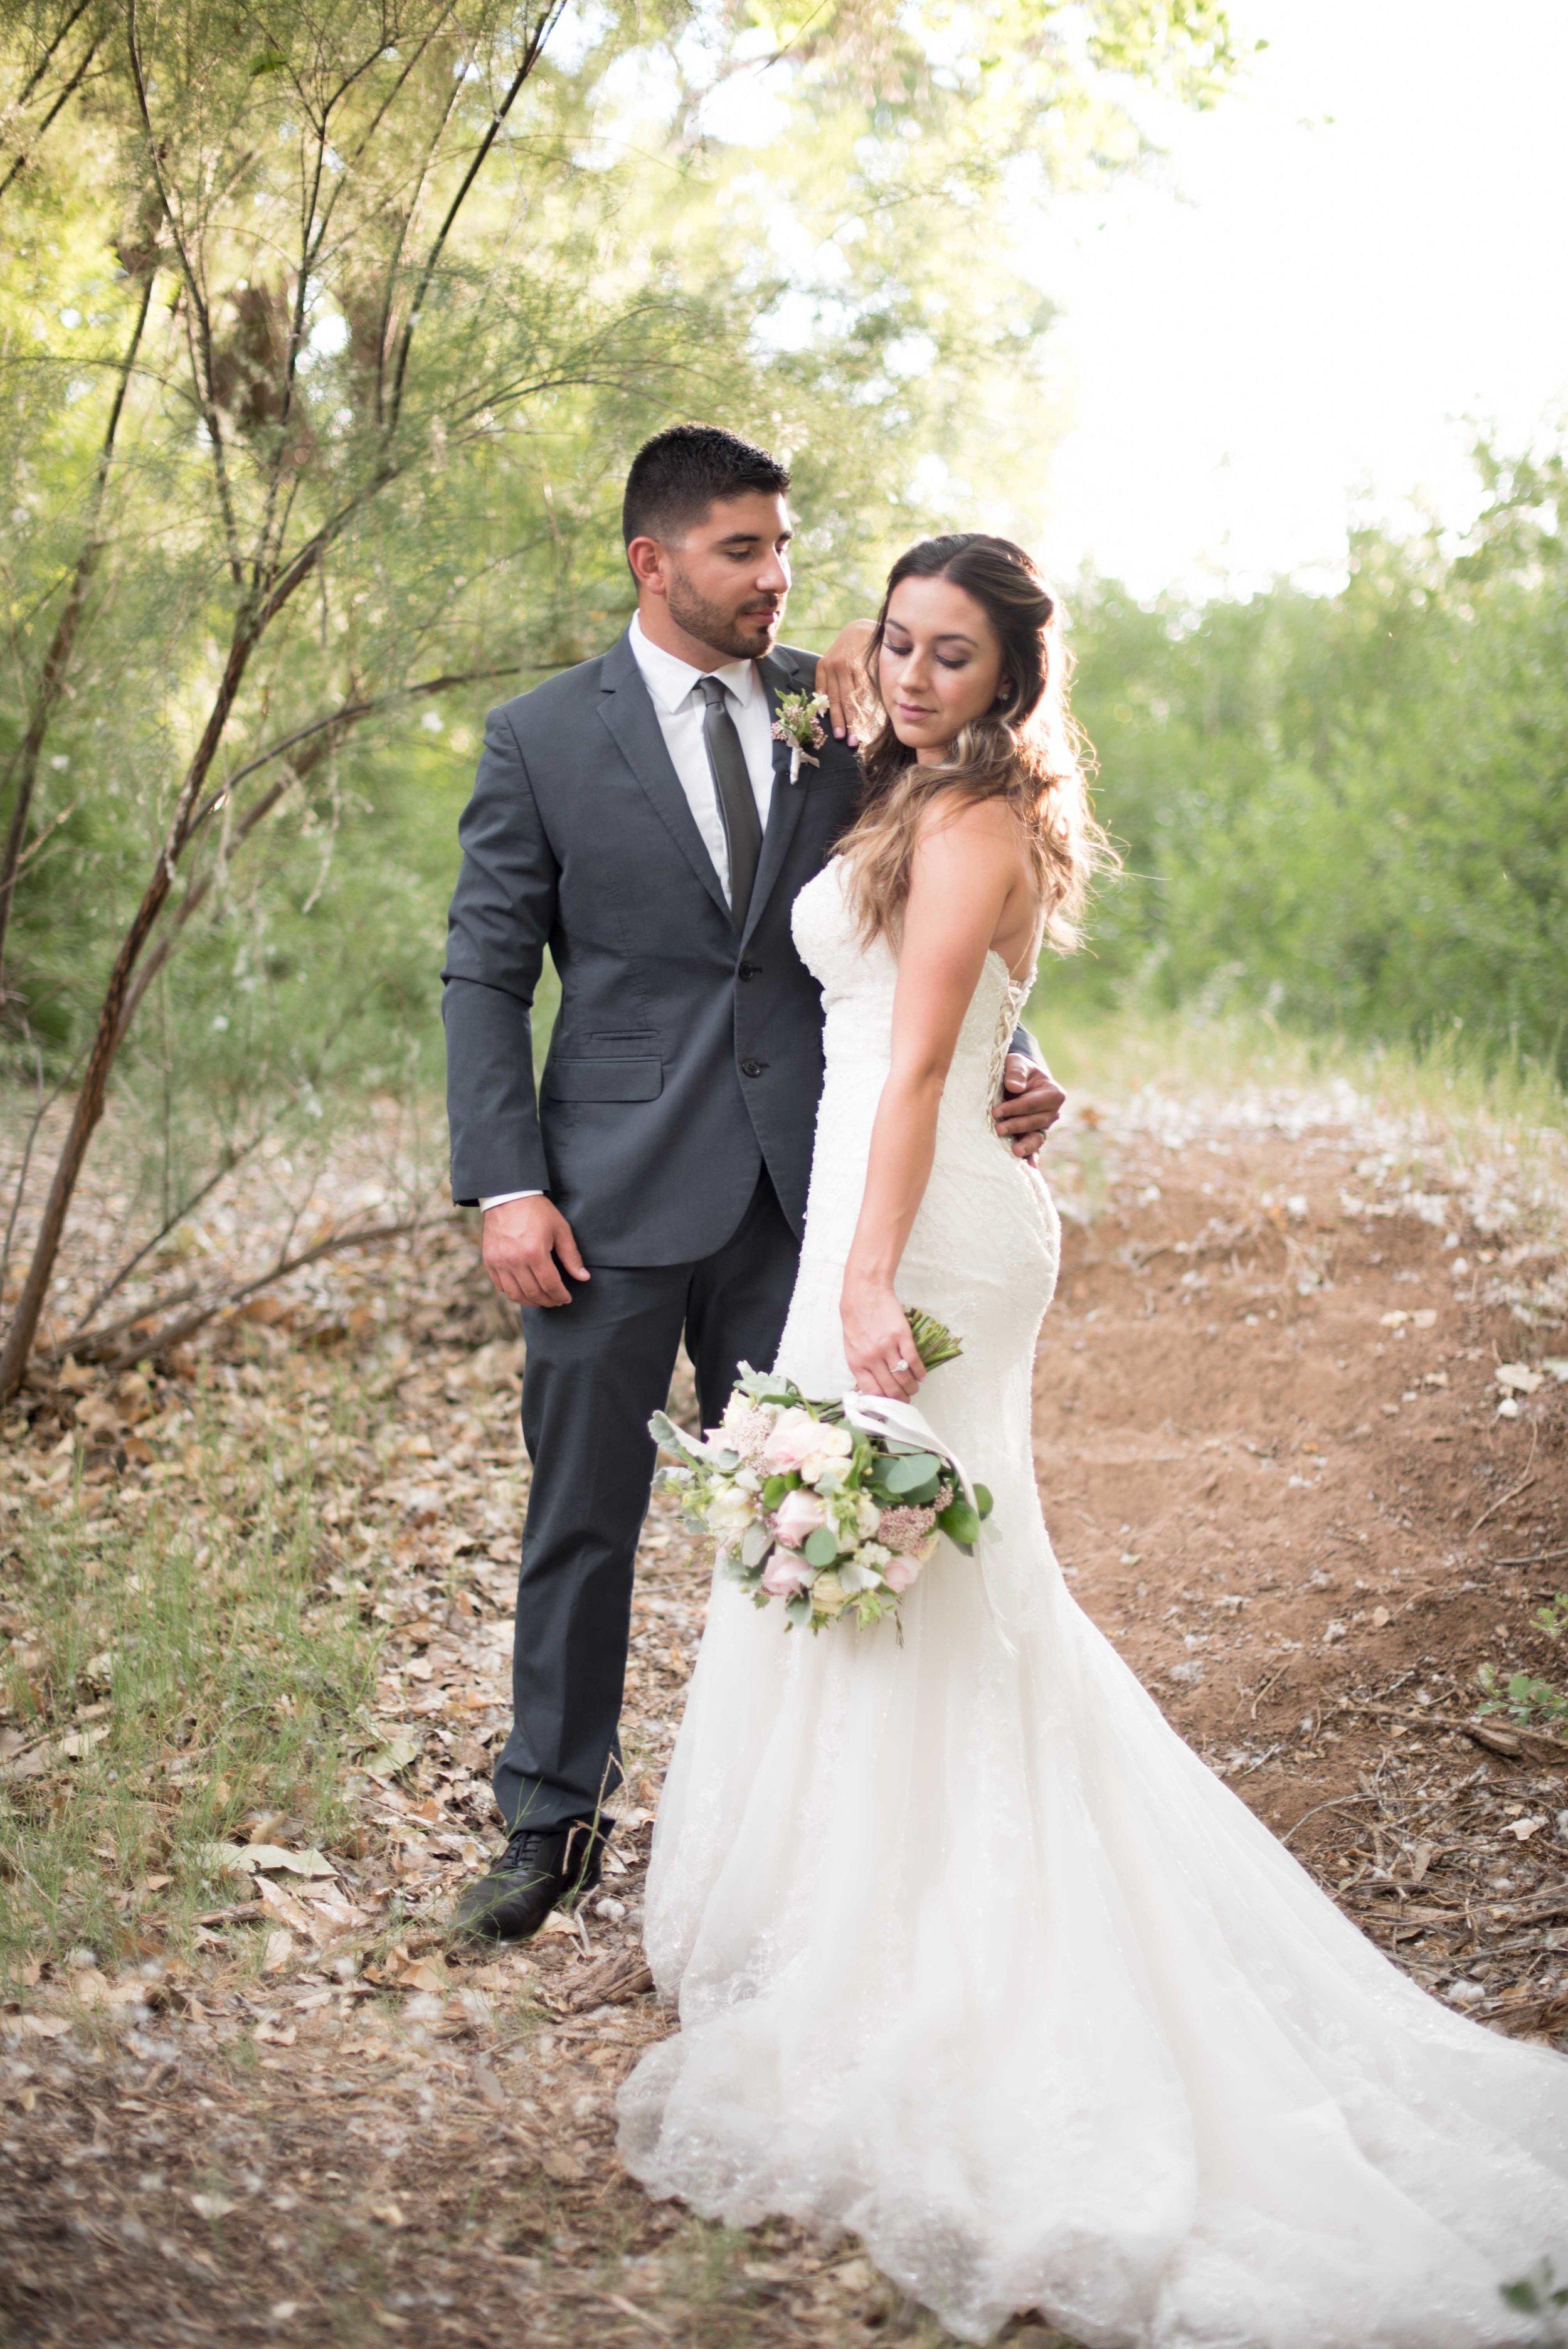 wedding photography poses albuquerque, nm